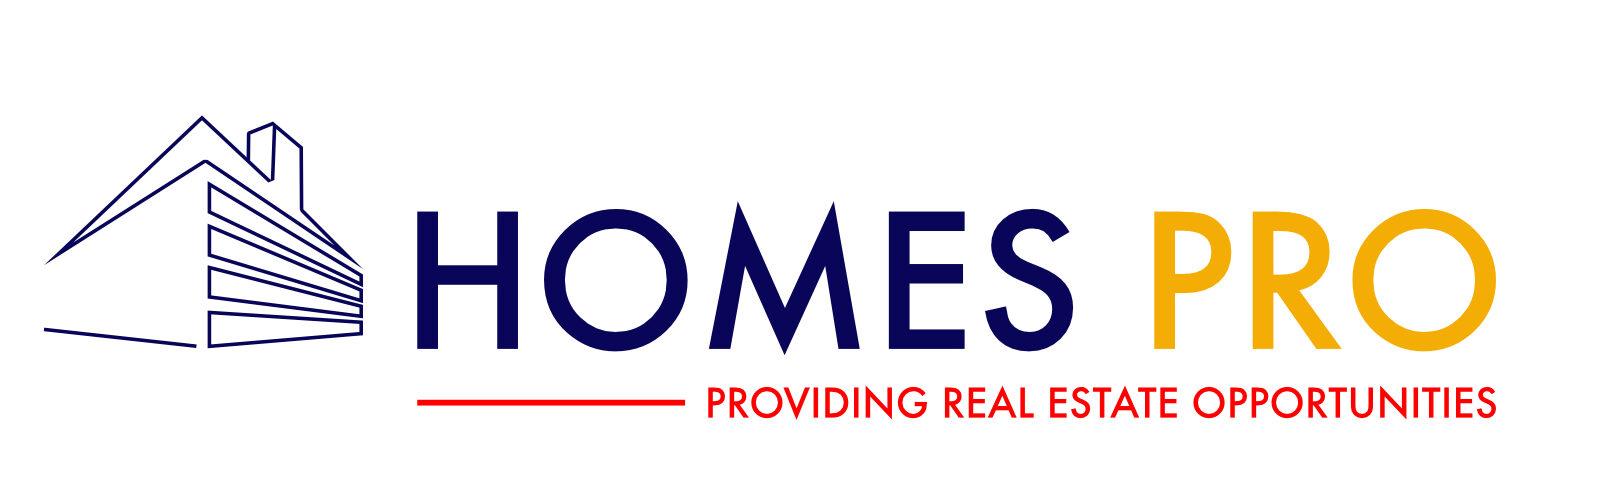 Homes Pro